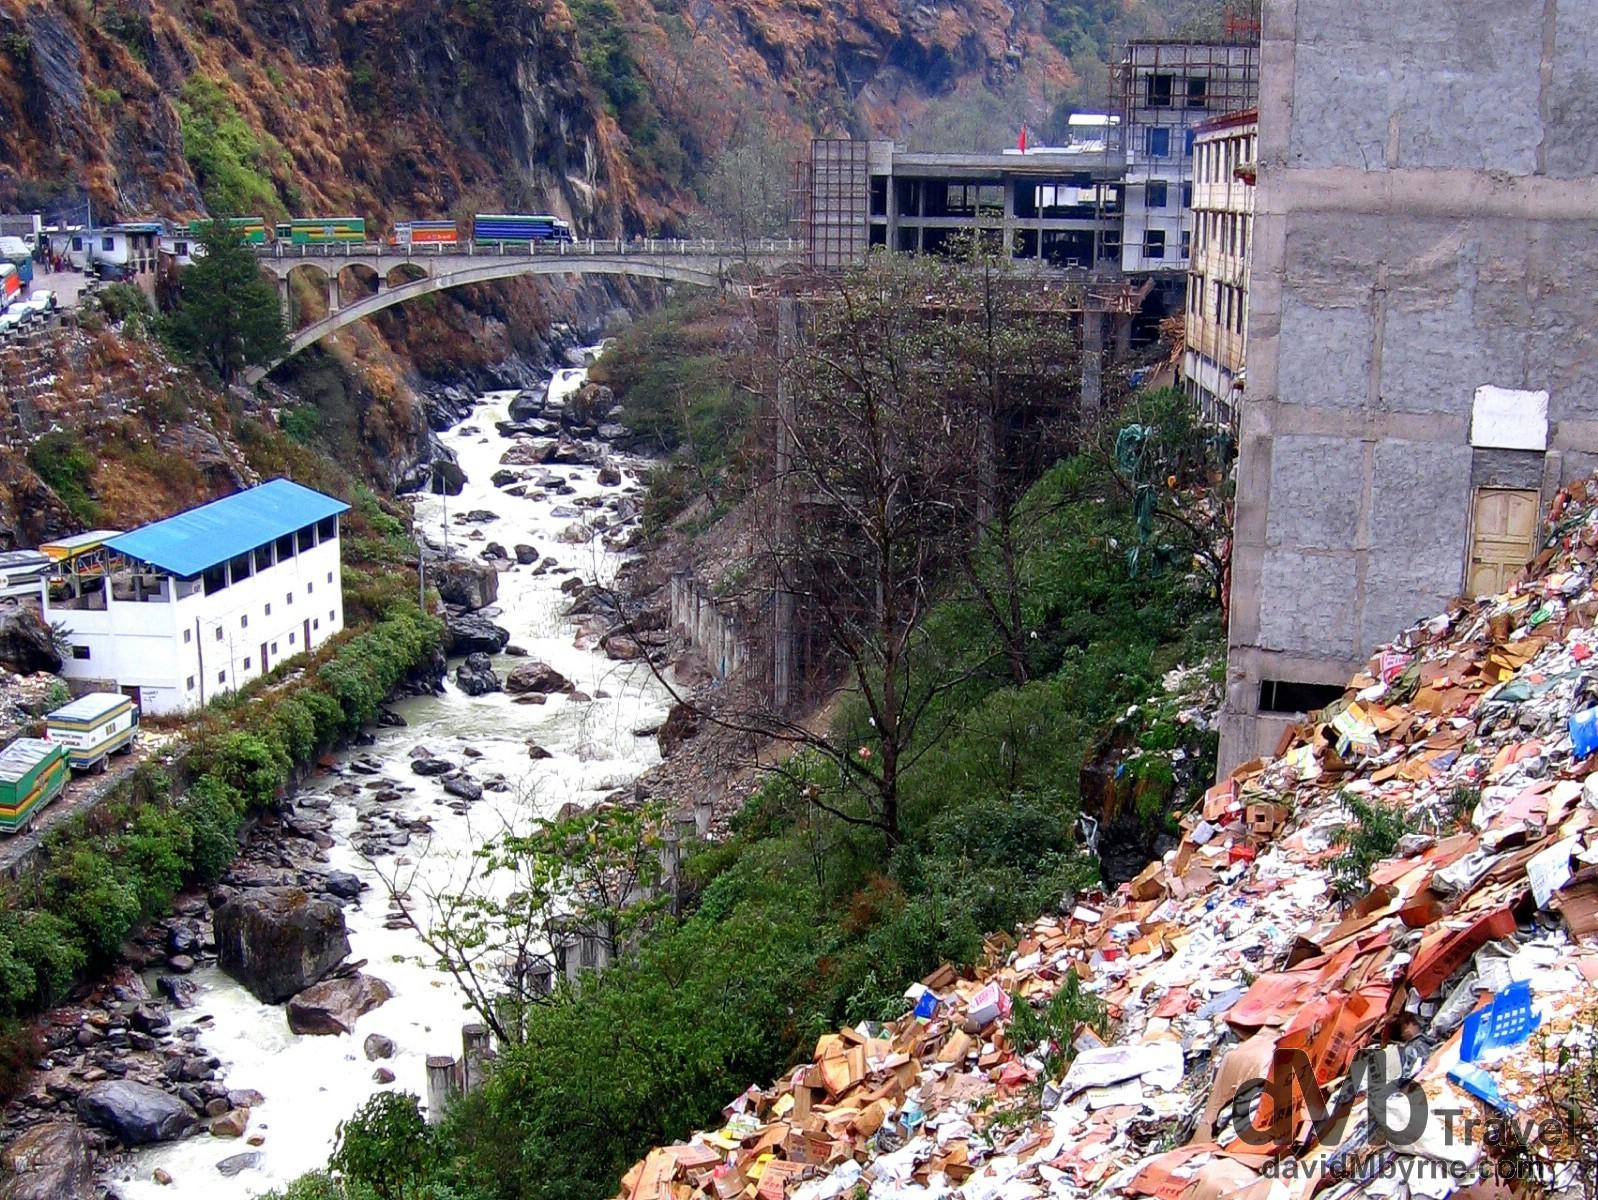 The Friendship Bridge at the Zhangum, China (right) / Kodari, Nepal (left) border crossing. March 3rd 2008